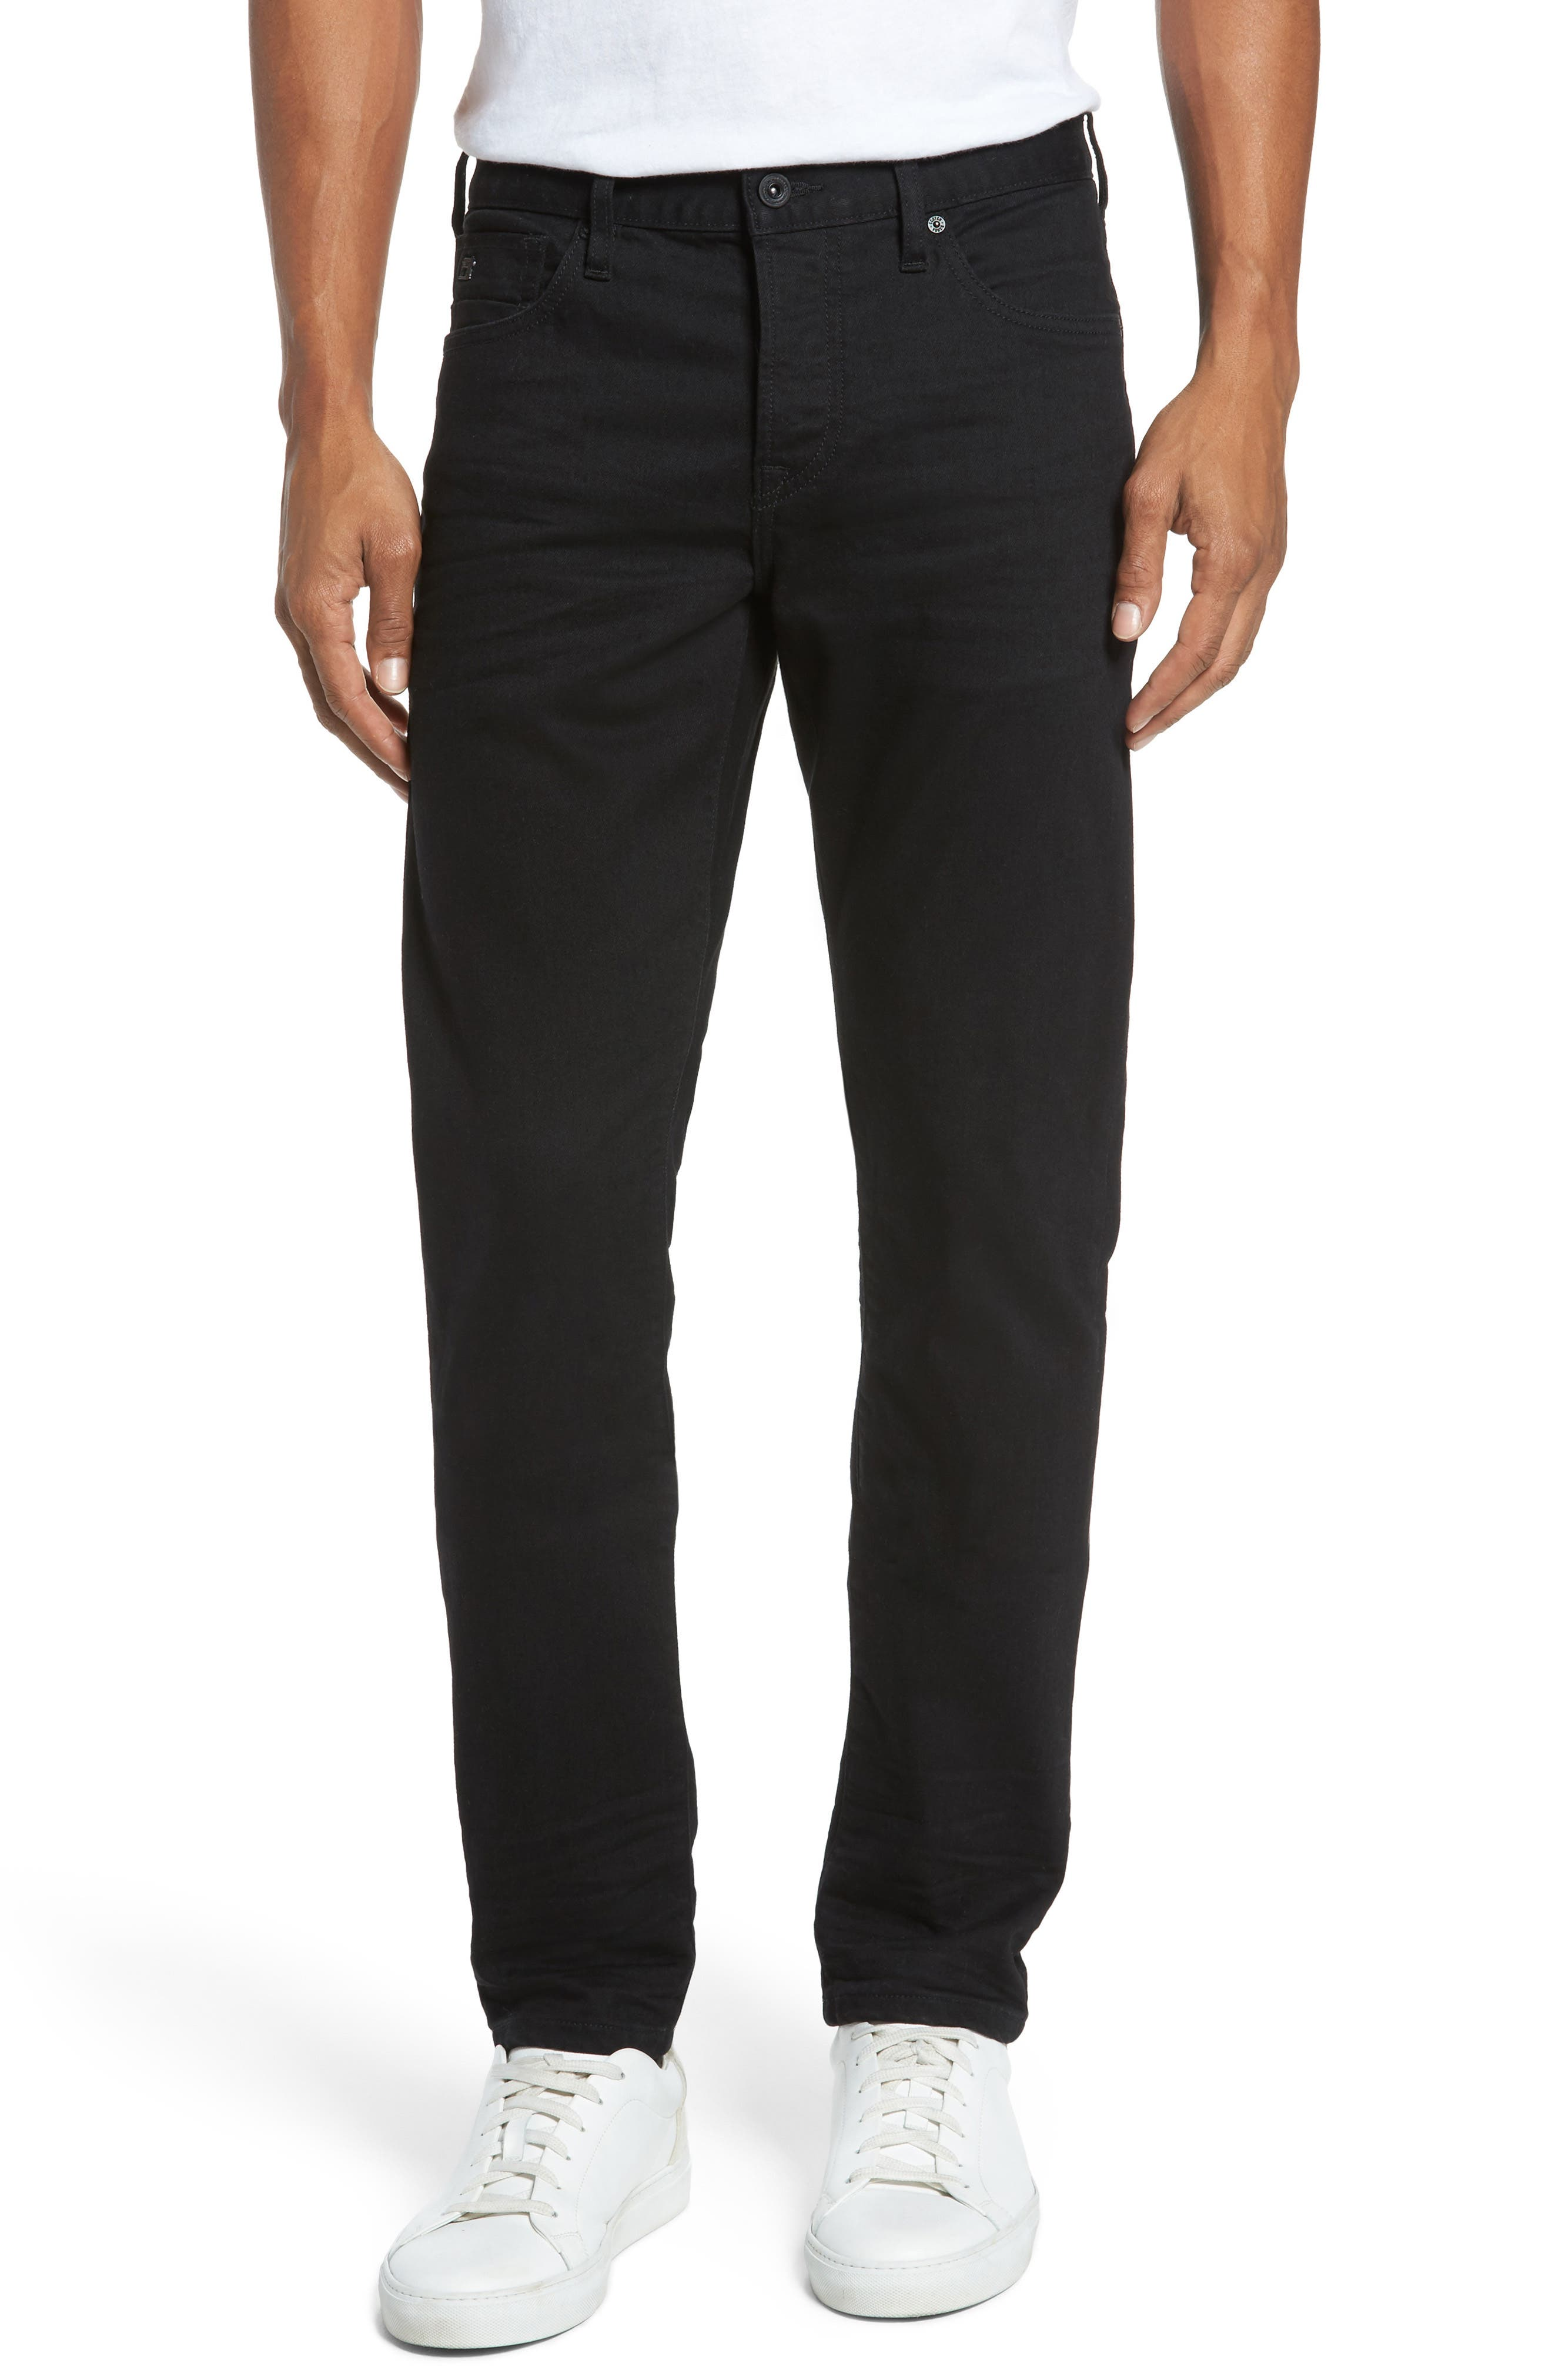 Alternate Image 1 Selected - Scotch & Soda Ralston Slim Straight Leg Jeans (Stay Black)